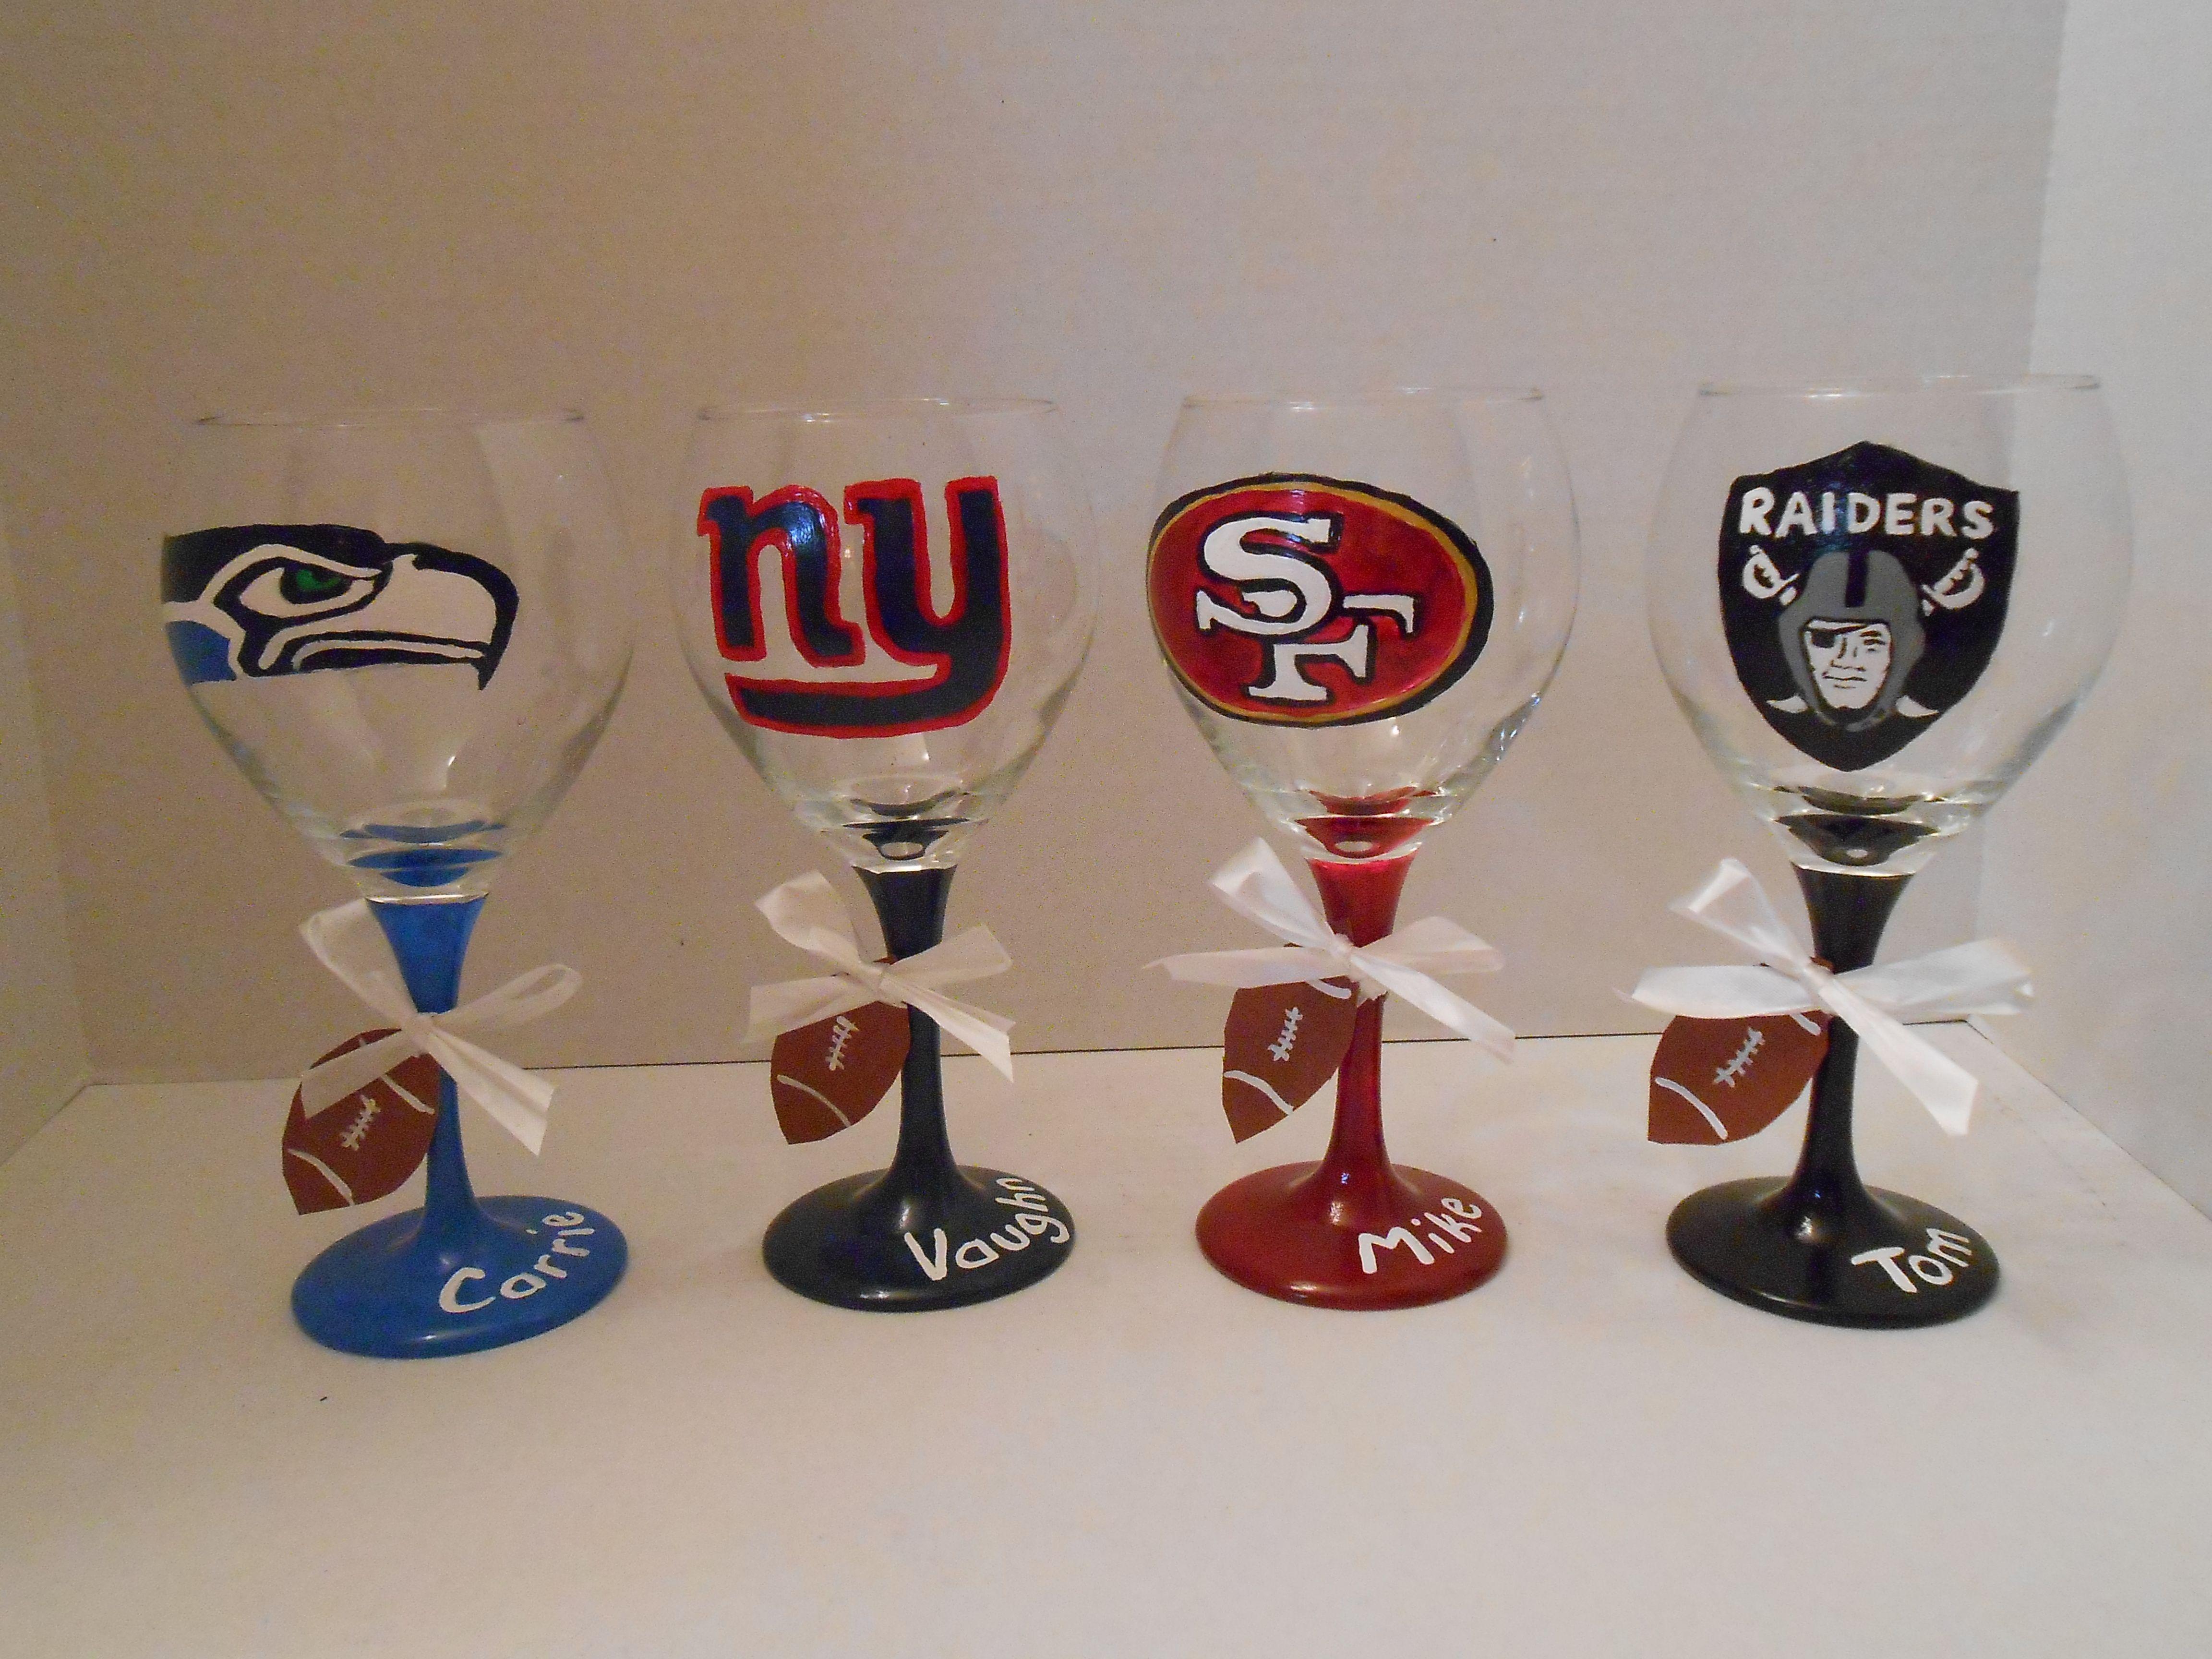 Football Rivals Diy Wine Glass Wine Glass Crafts Diy Wine Glasses